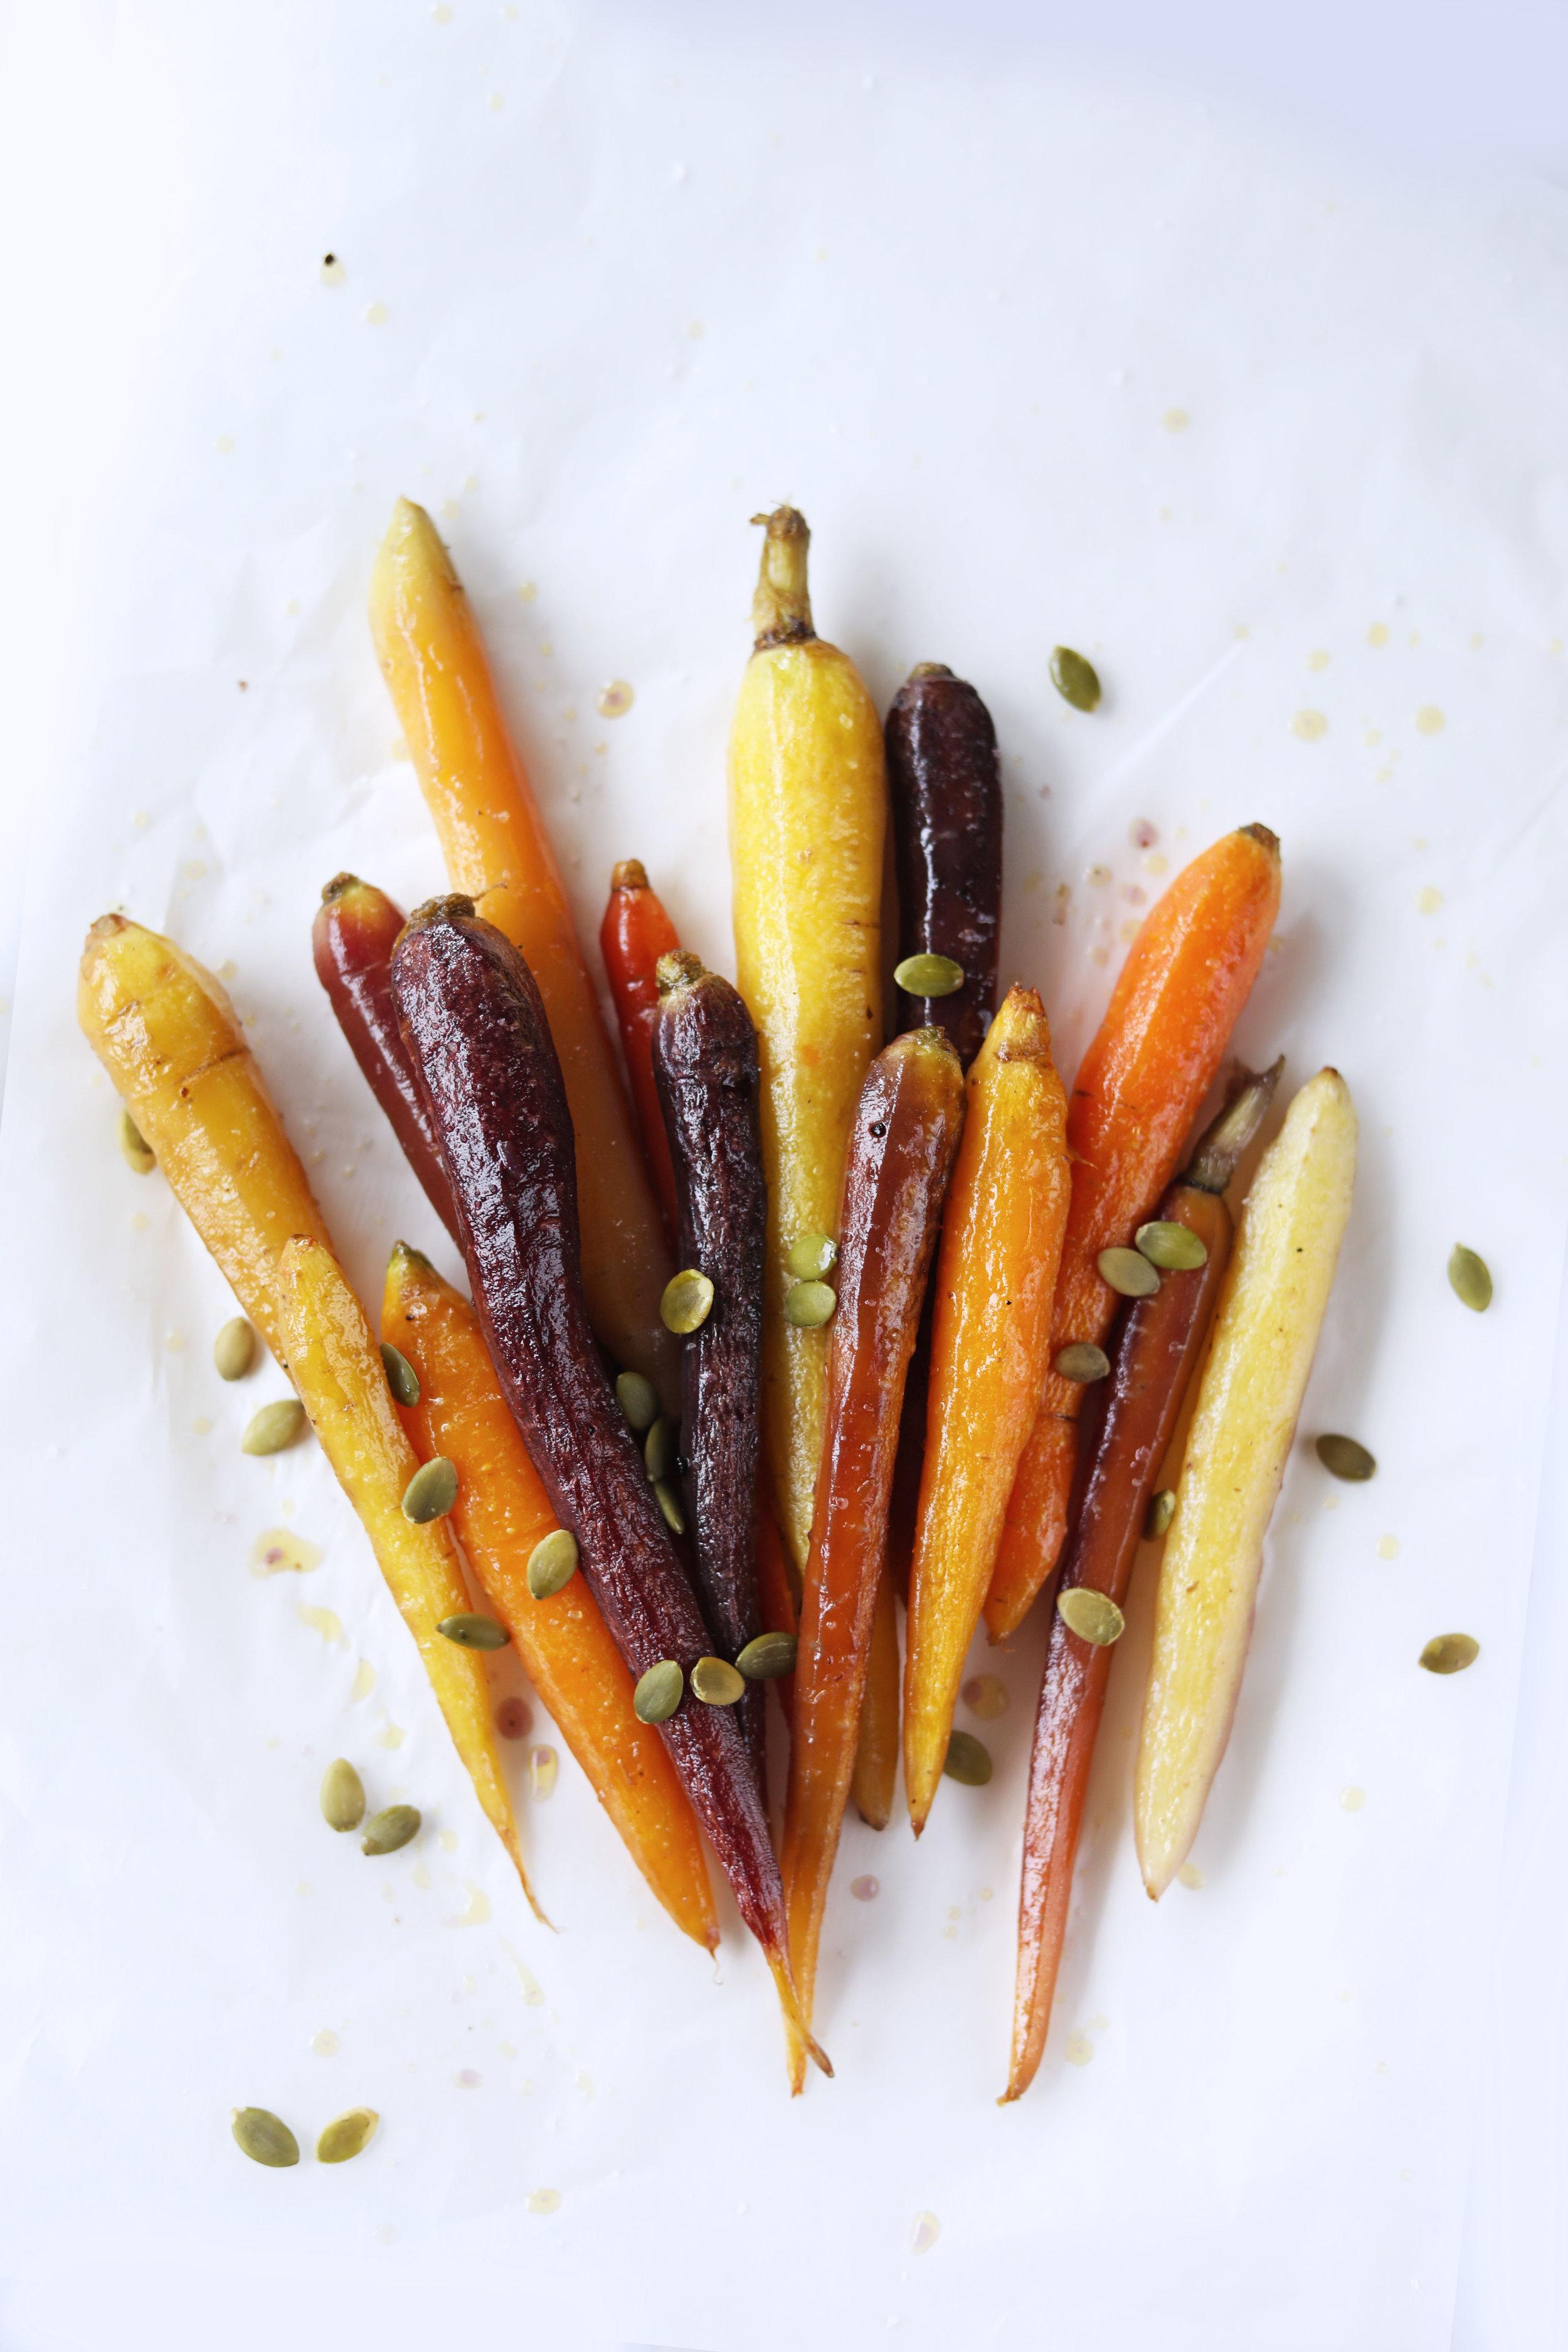 1T2A5500-heirloom-carrots.jpg